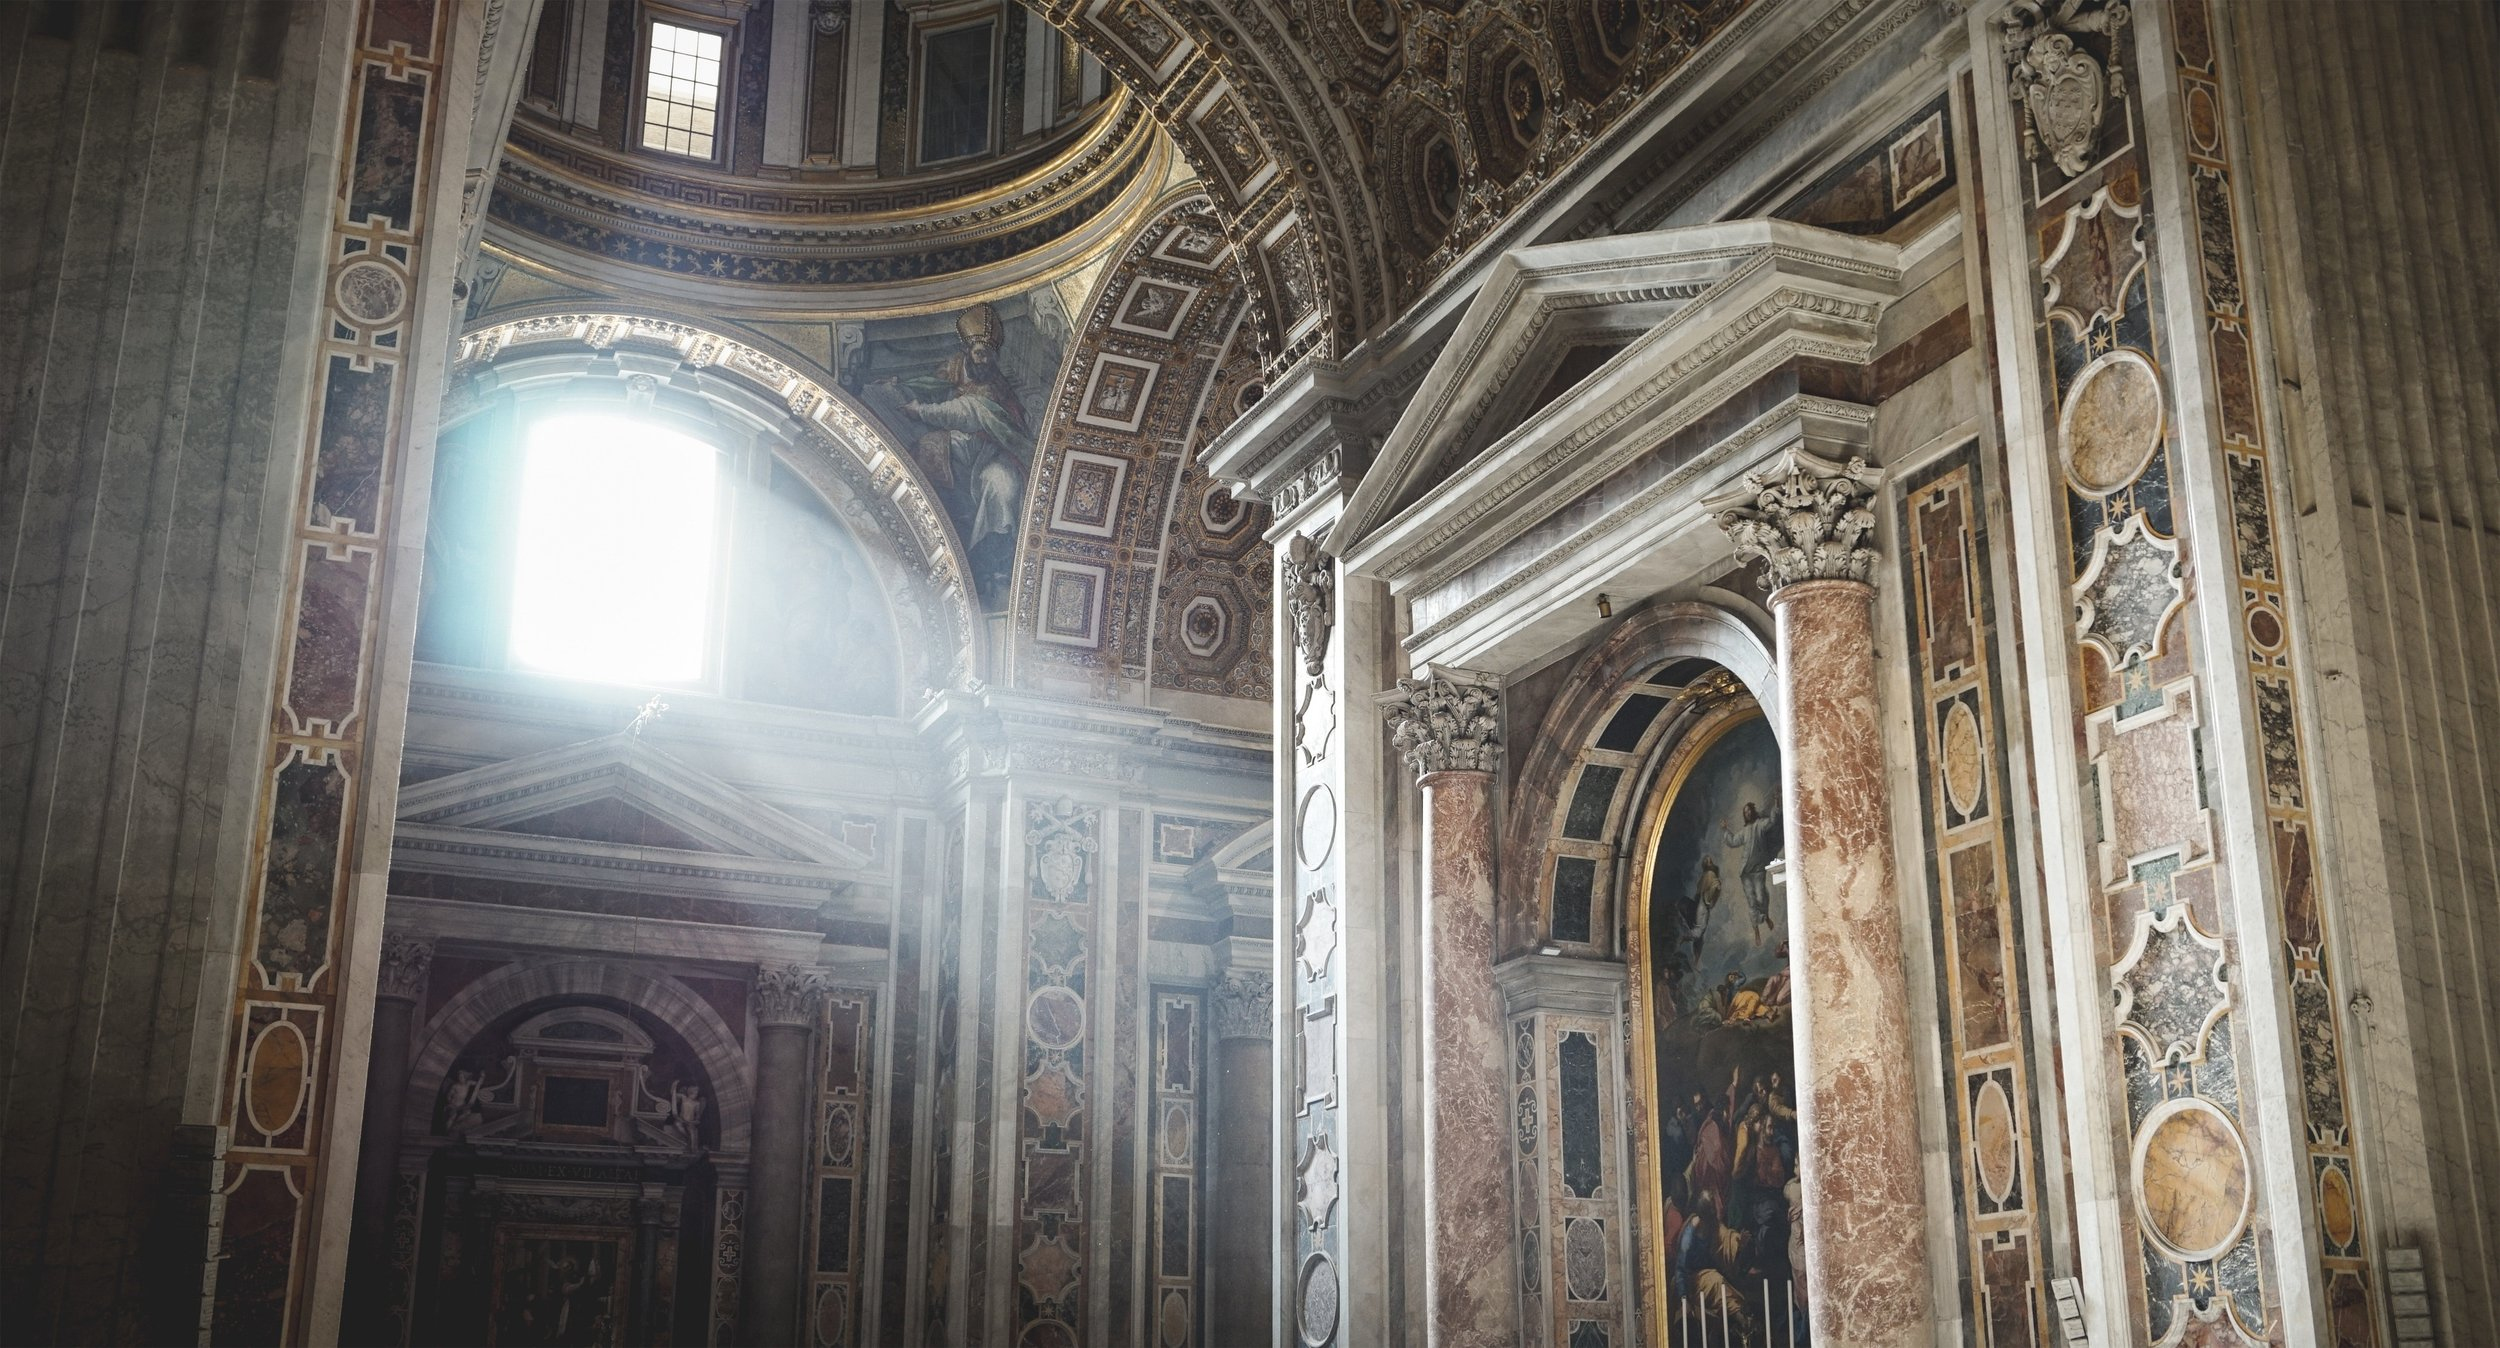 ancient-arch-architecture-356658.jpg